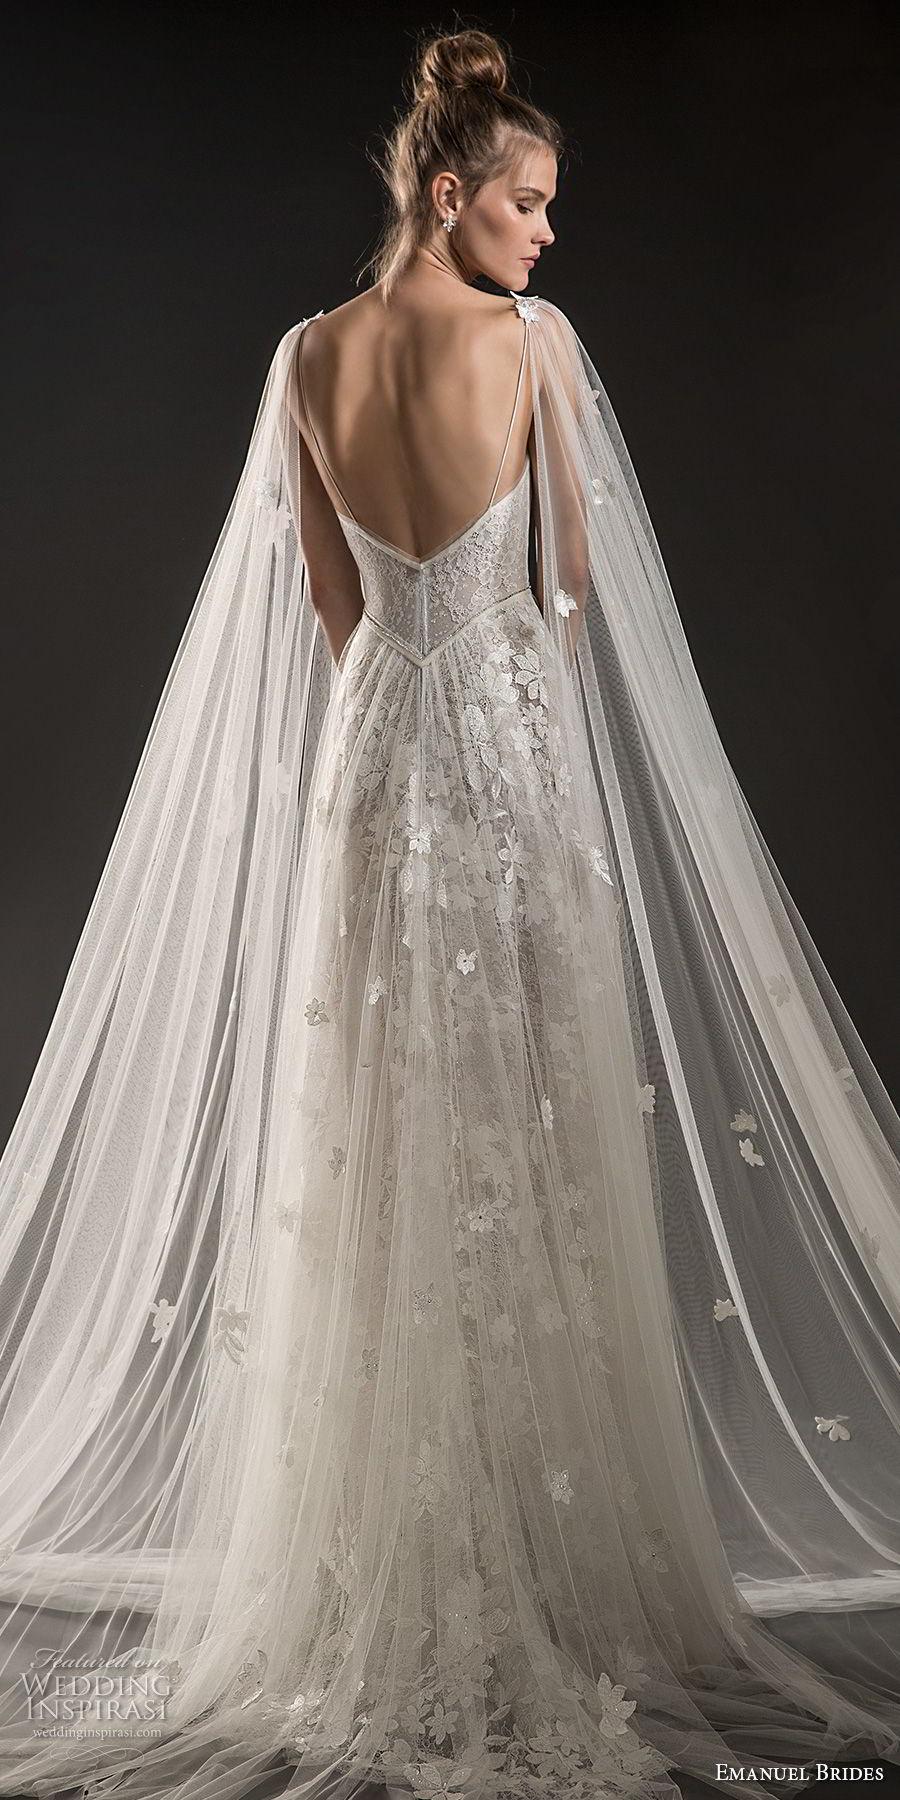 emanuel brides 2018 bridal sleeveless thin strap deep plunging sweetheart neckline full embellishment tulle skirt romantic sexy soft a  line wedding dress medium train (02) bv